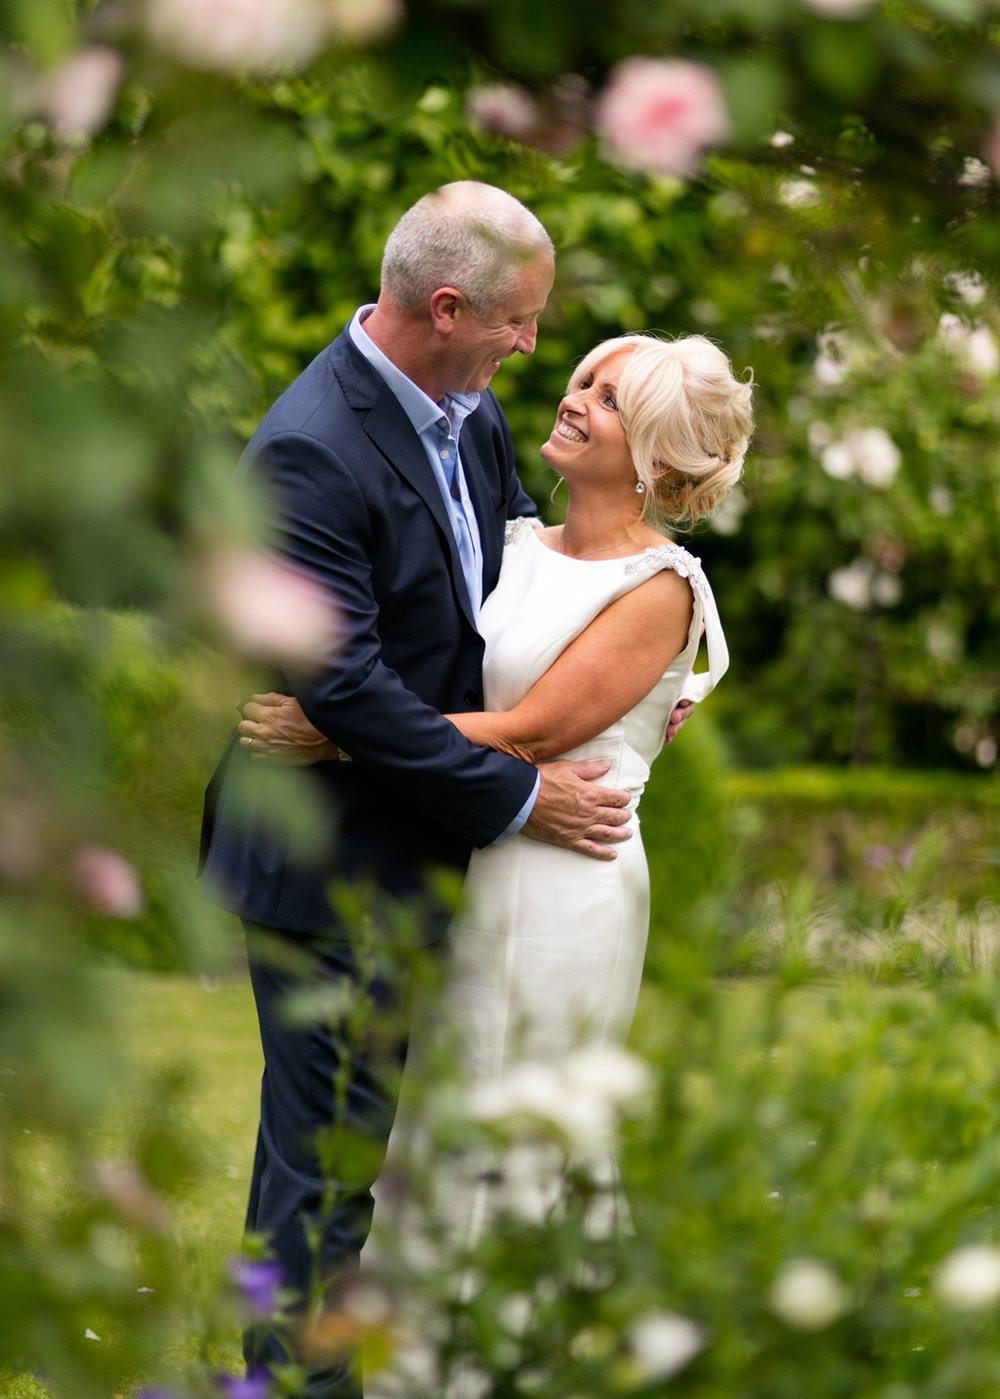 Wedding-Photography-Lord-Leycester-Hospital17.jpg